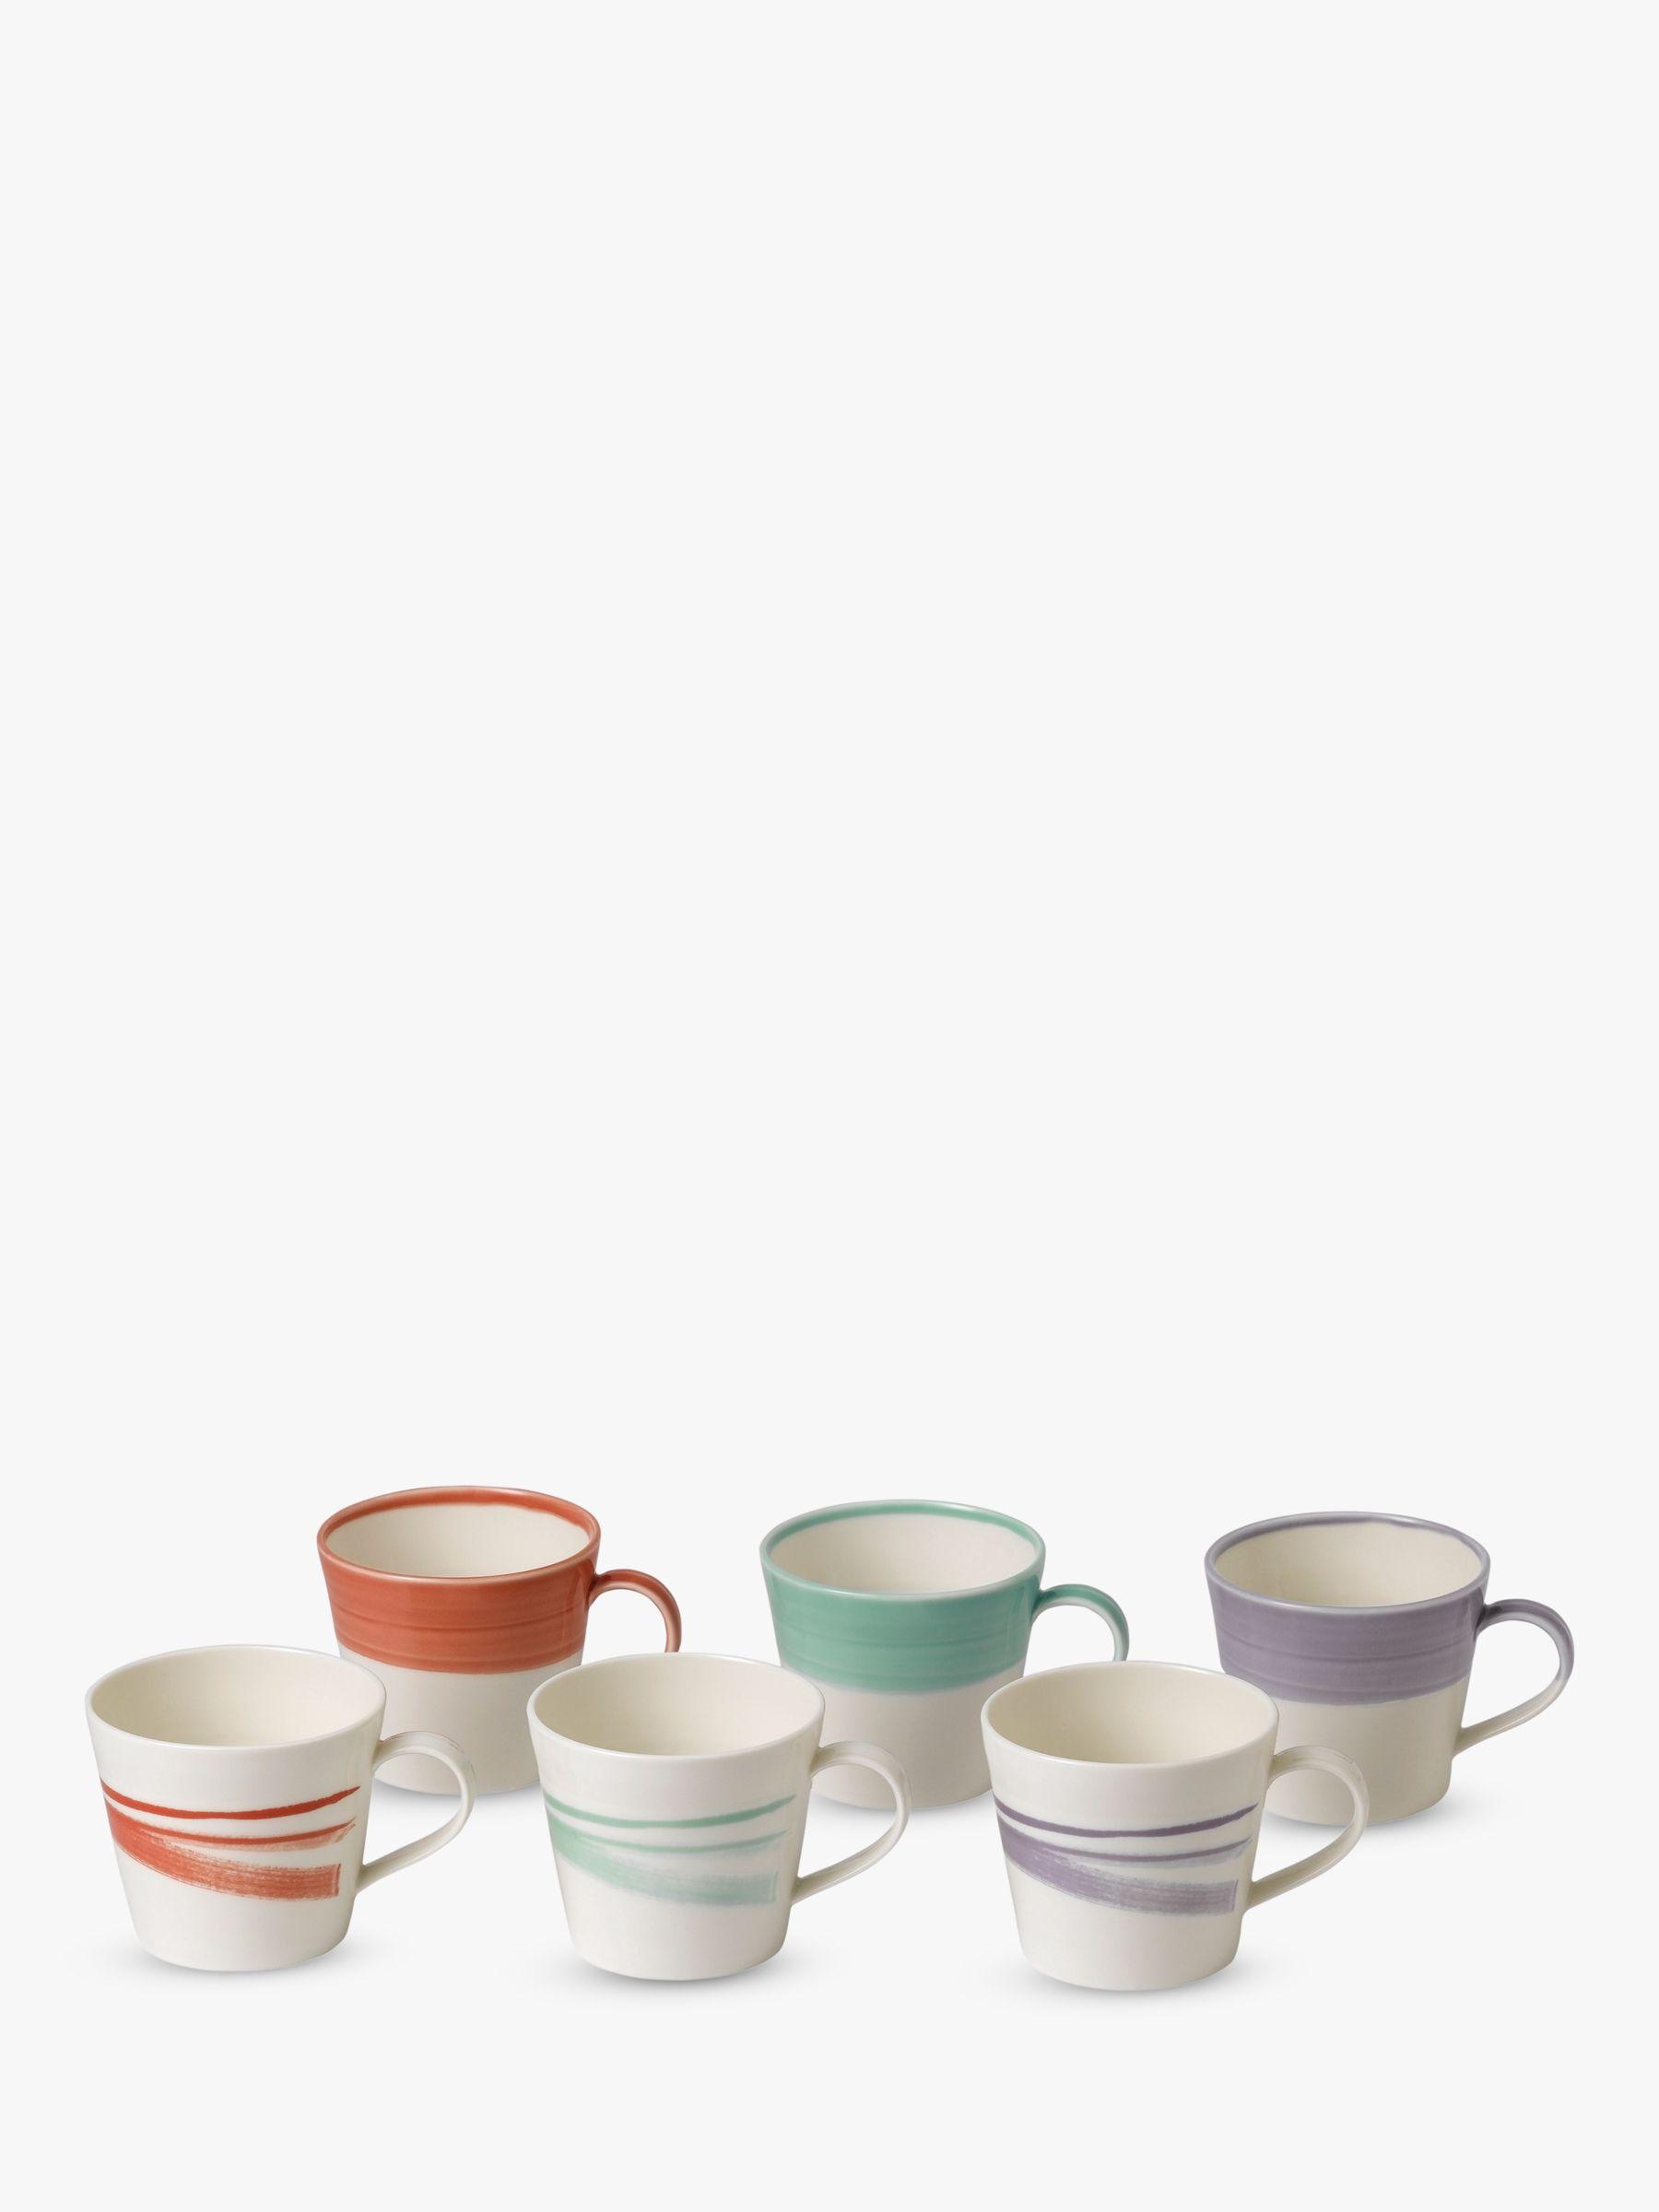 Royal Doulton Royal Doulton 1815 Bold Mugs, Set of 6, 400ml, Assorted